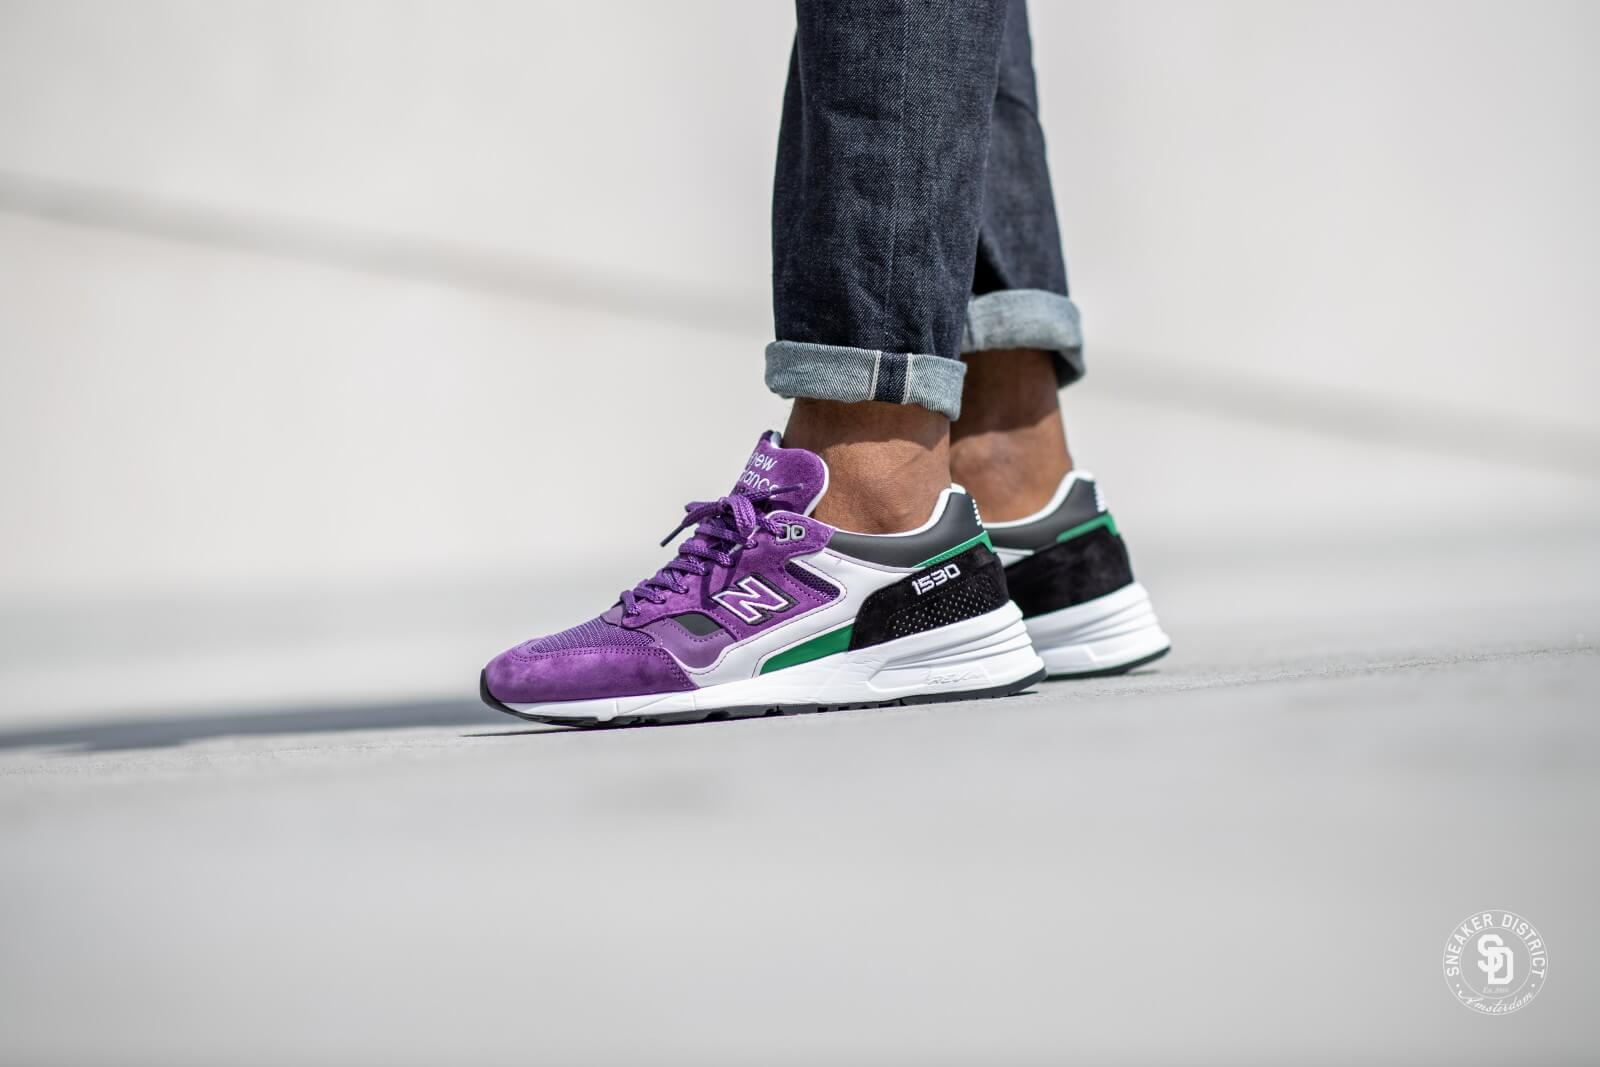 New Balance M1530 CRT Purple - 721761-60-14